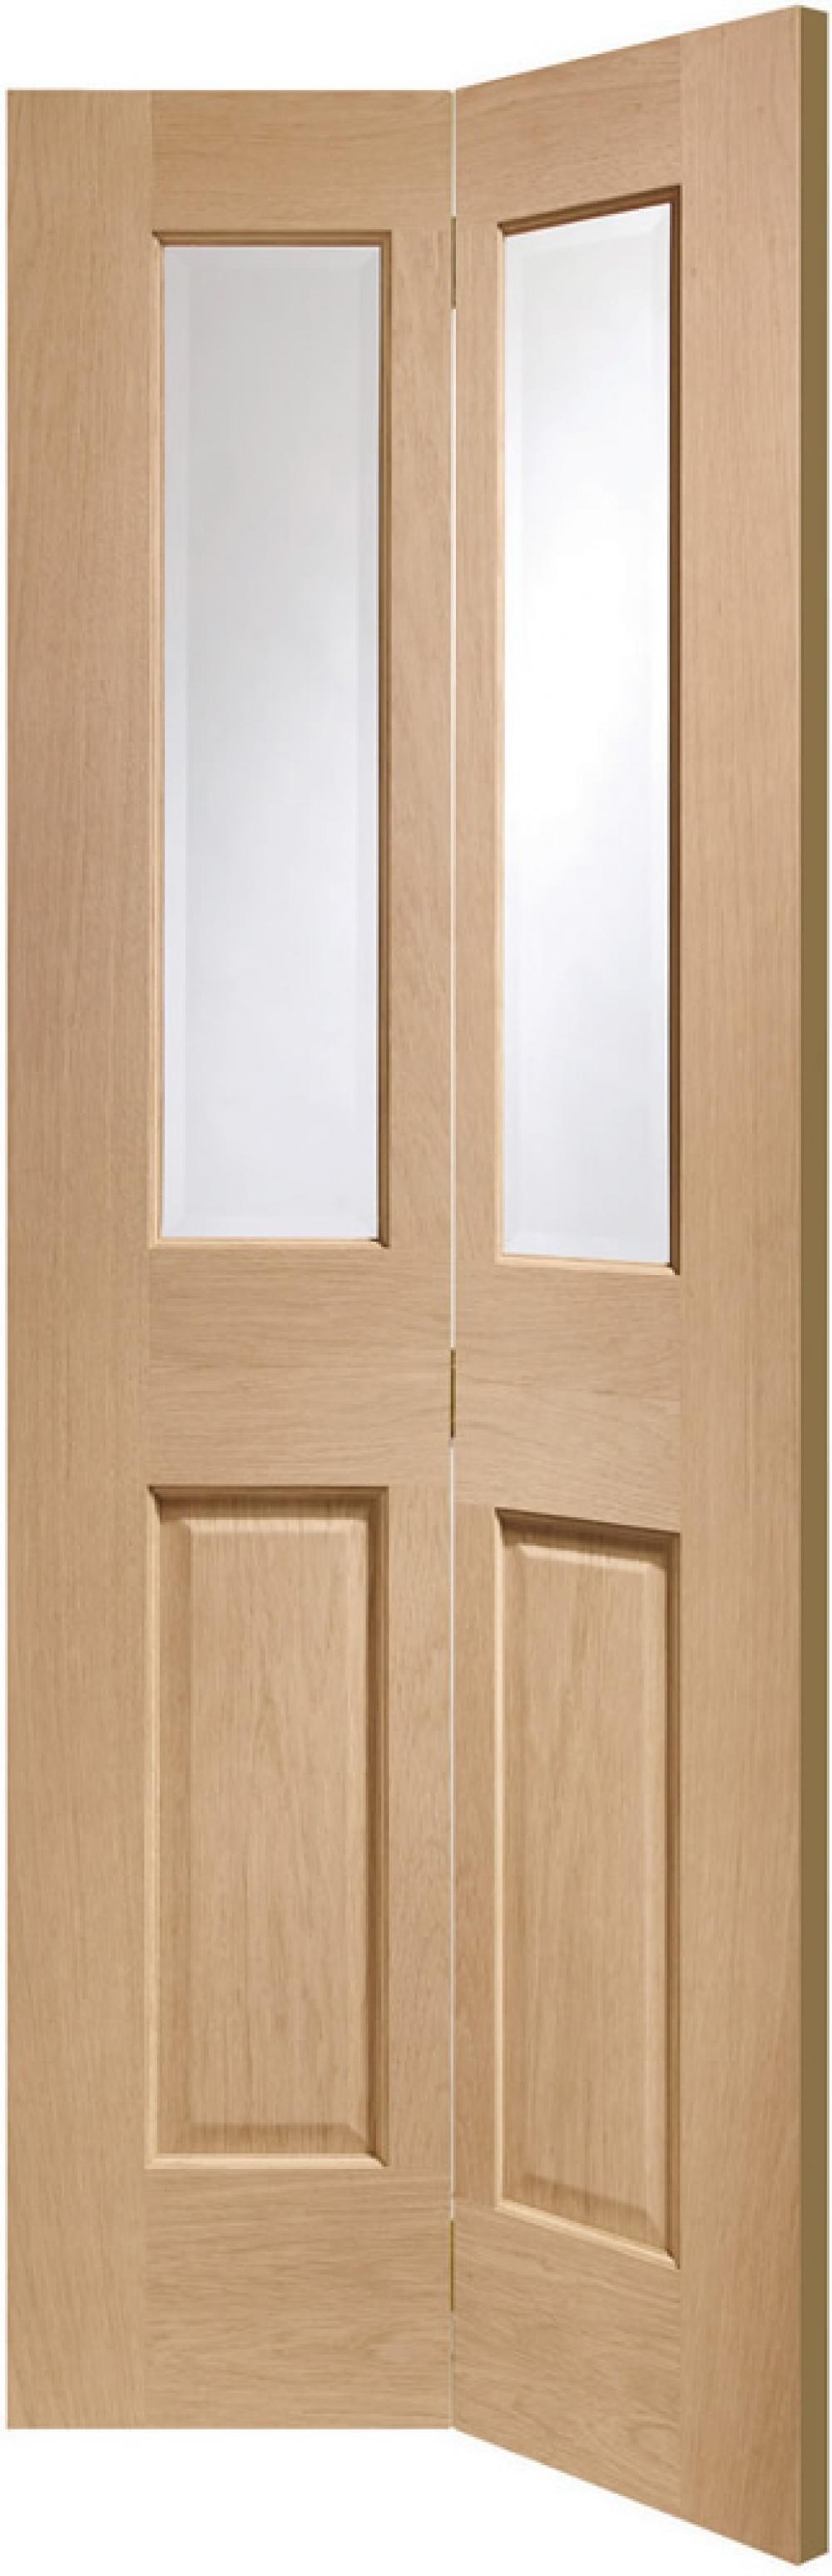 Malton Oak Glazed Bifold Door